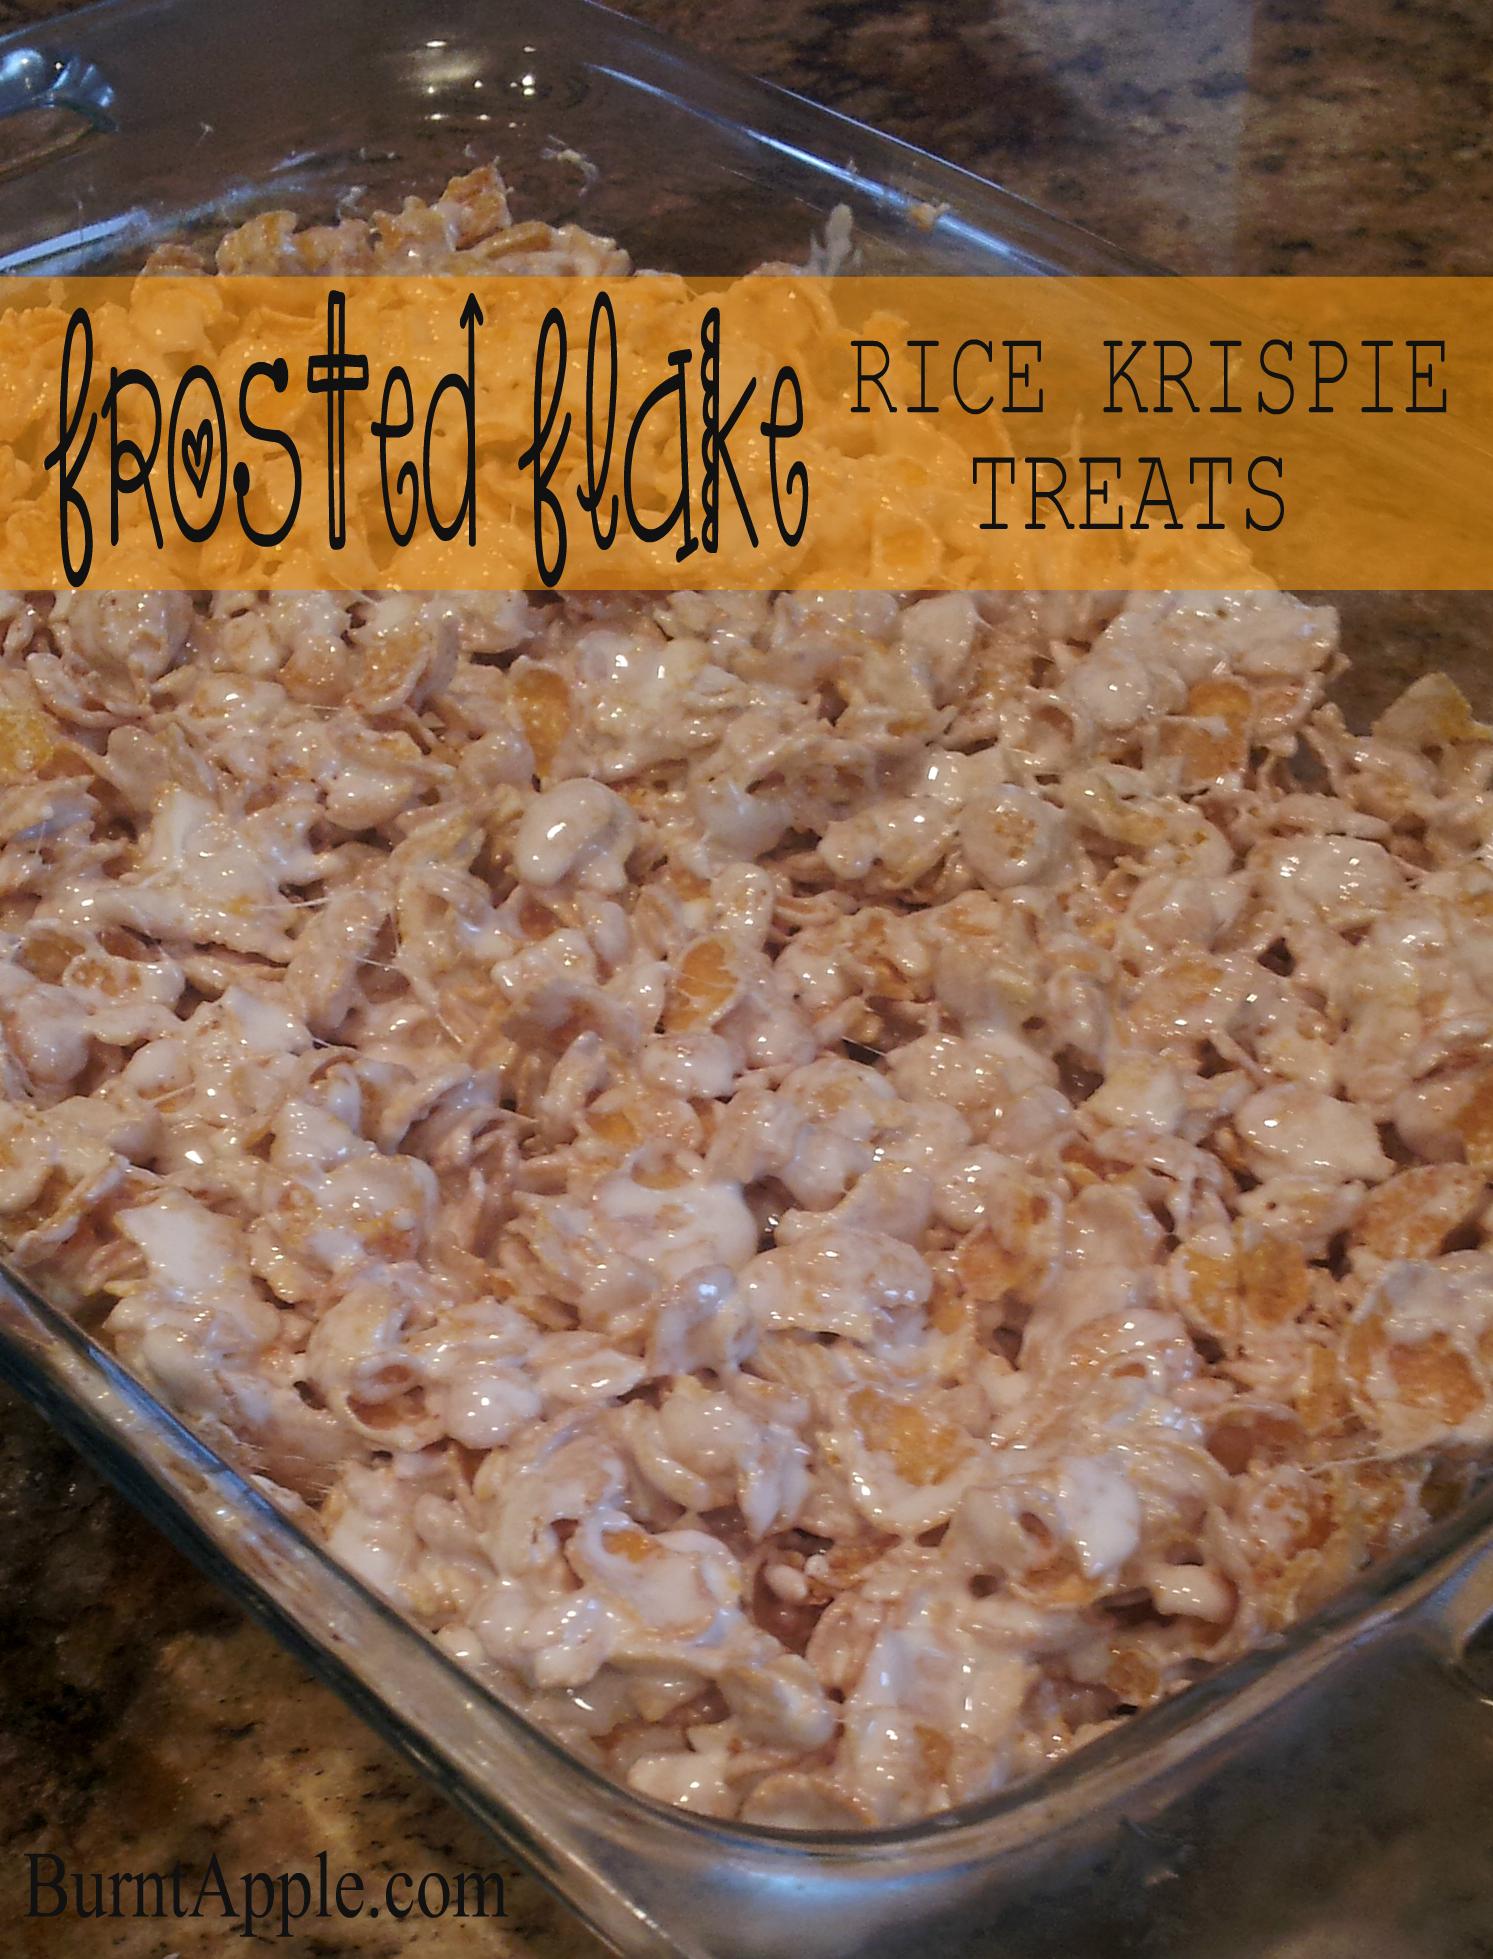 Frosted Flake Rice Krispie Treats Burnt Apple